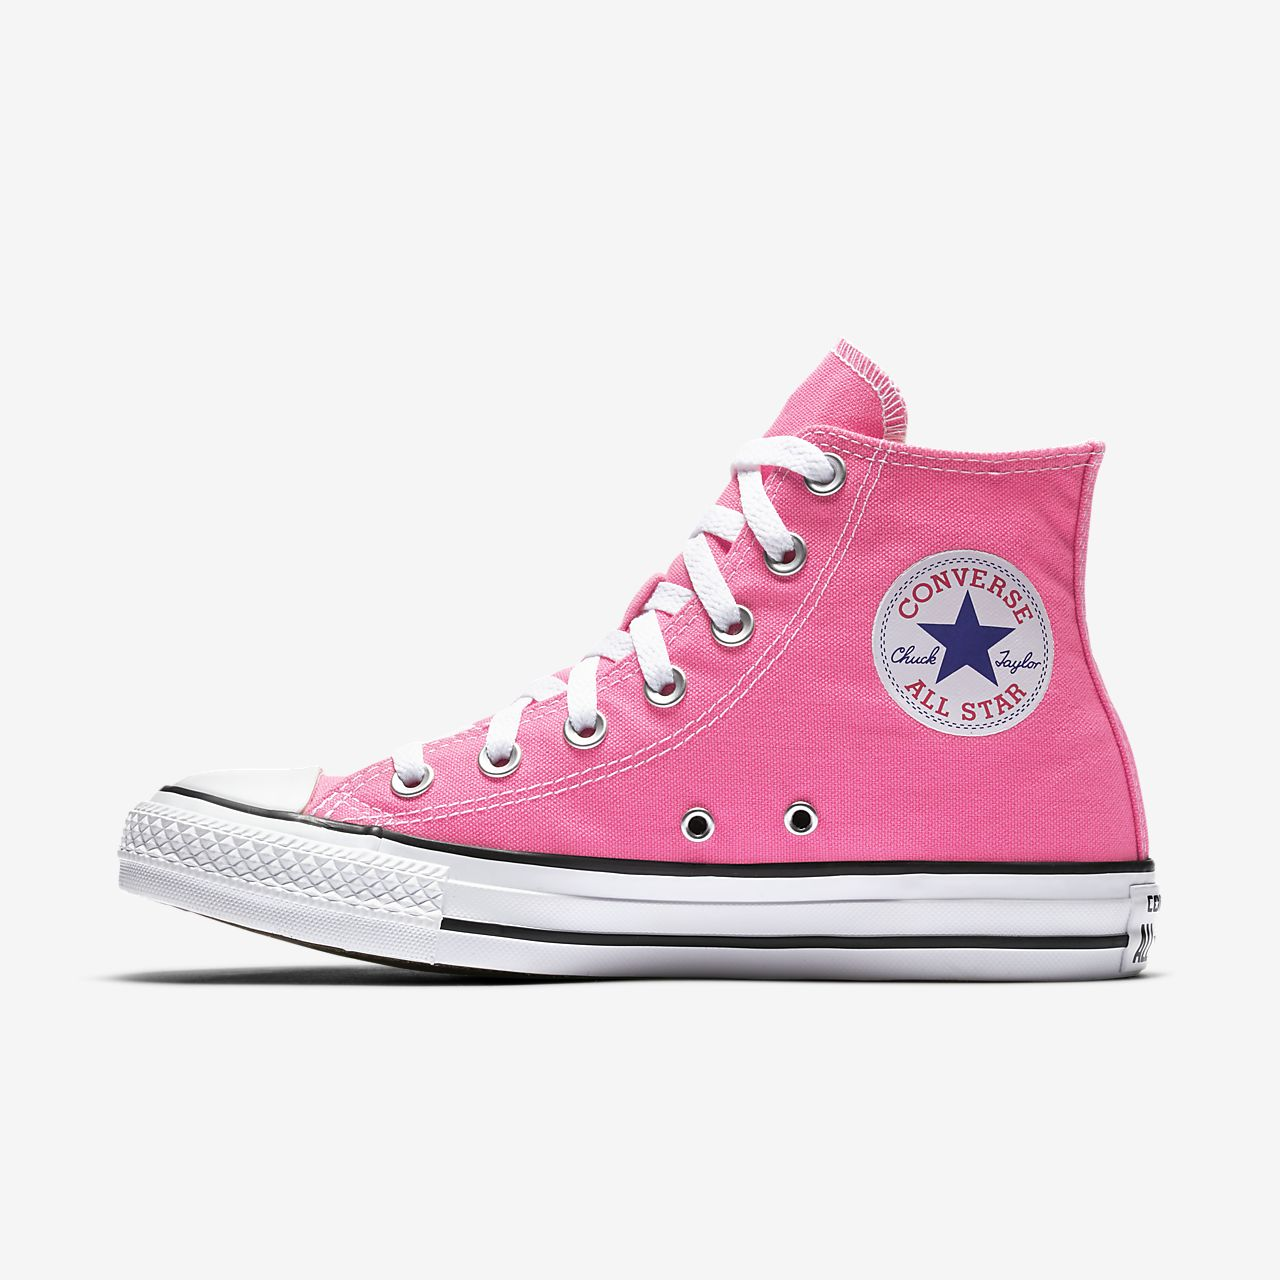 Converse Chuck Taylor All Star Seasonal High Top Women's Shoe